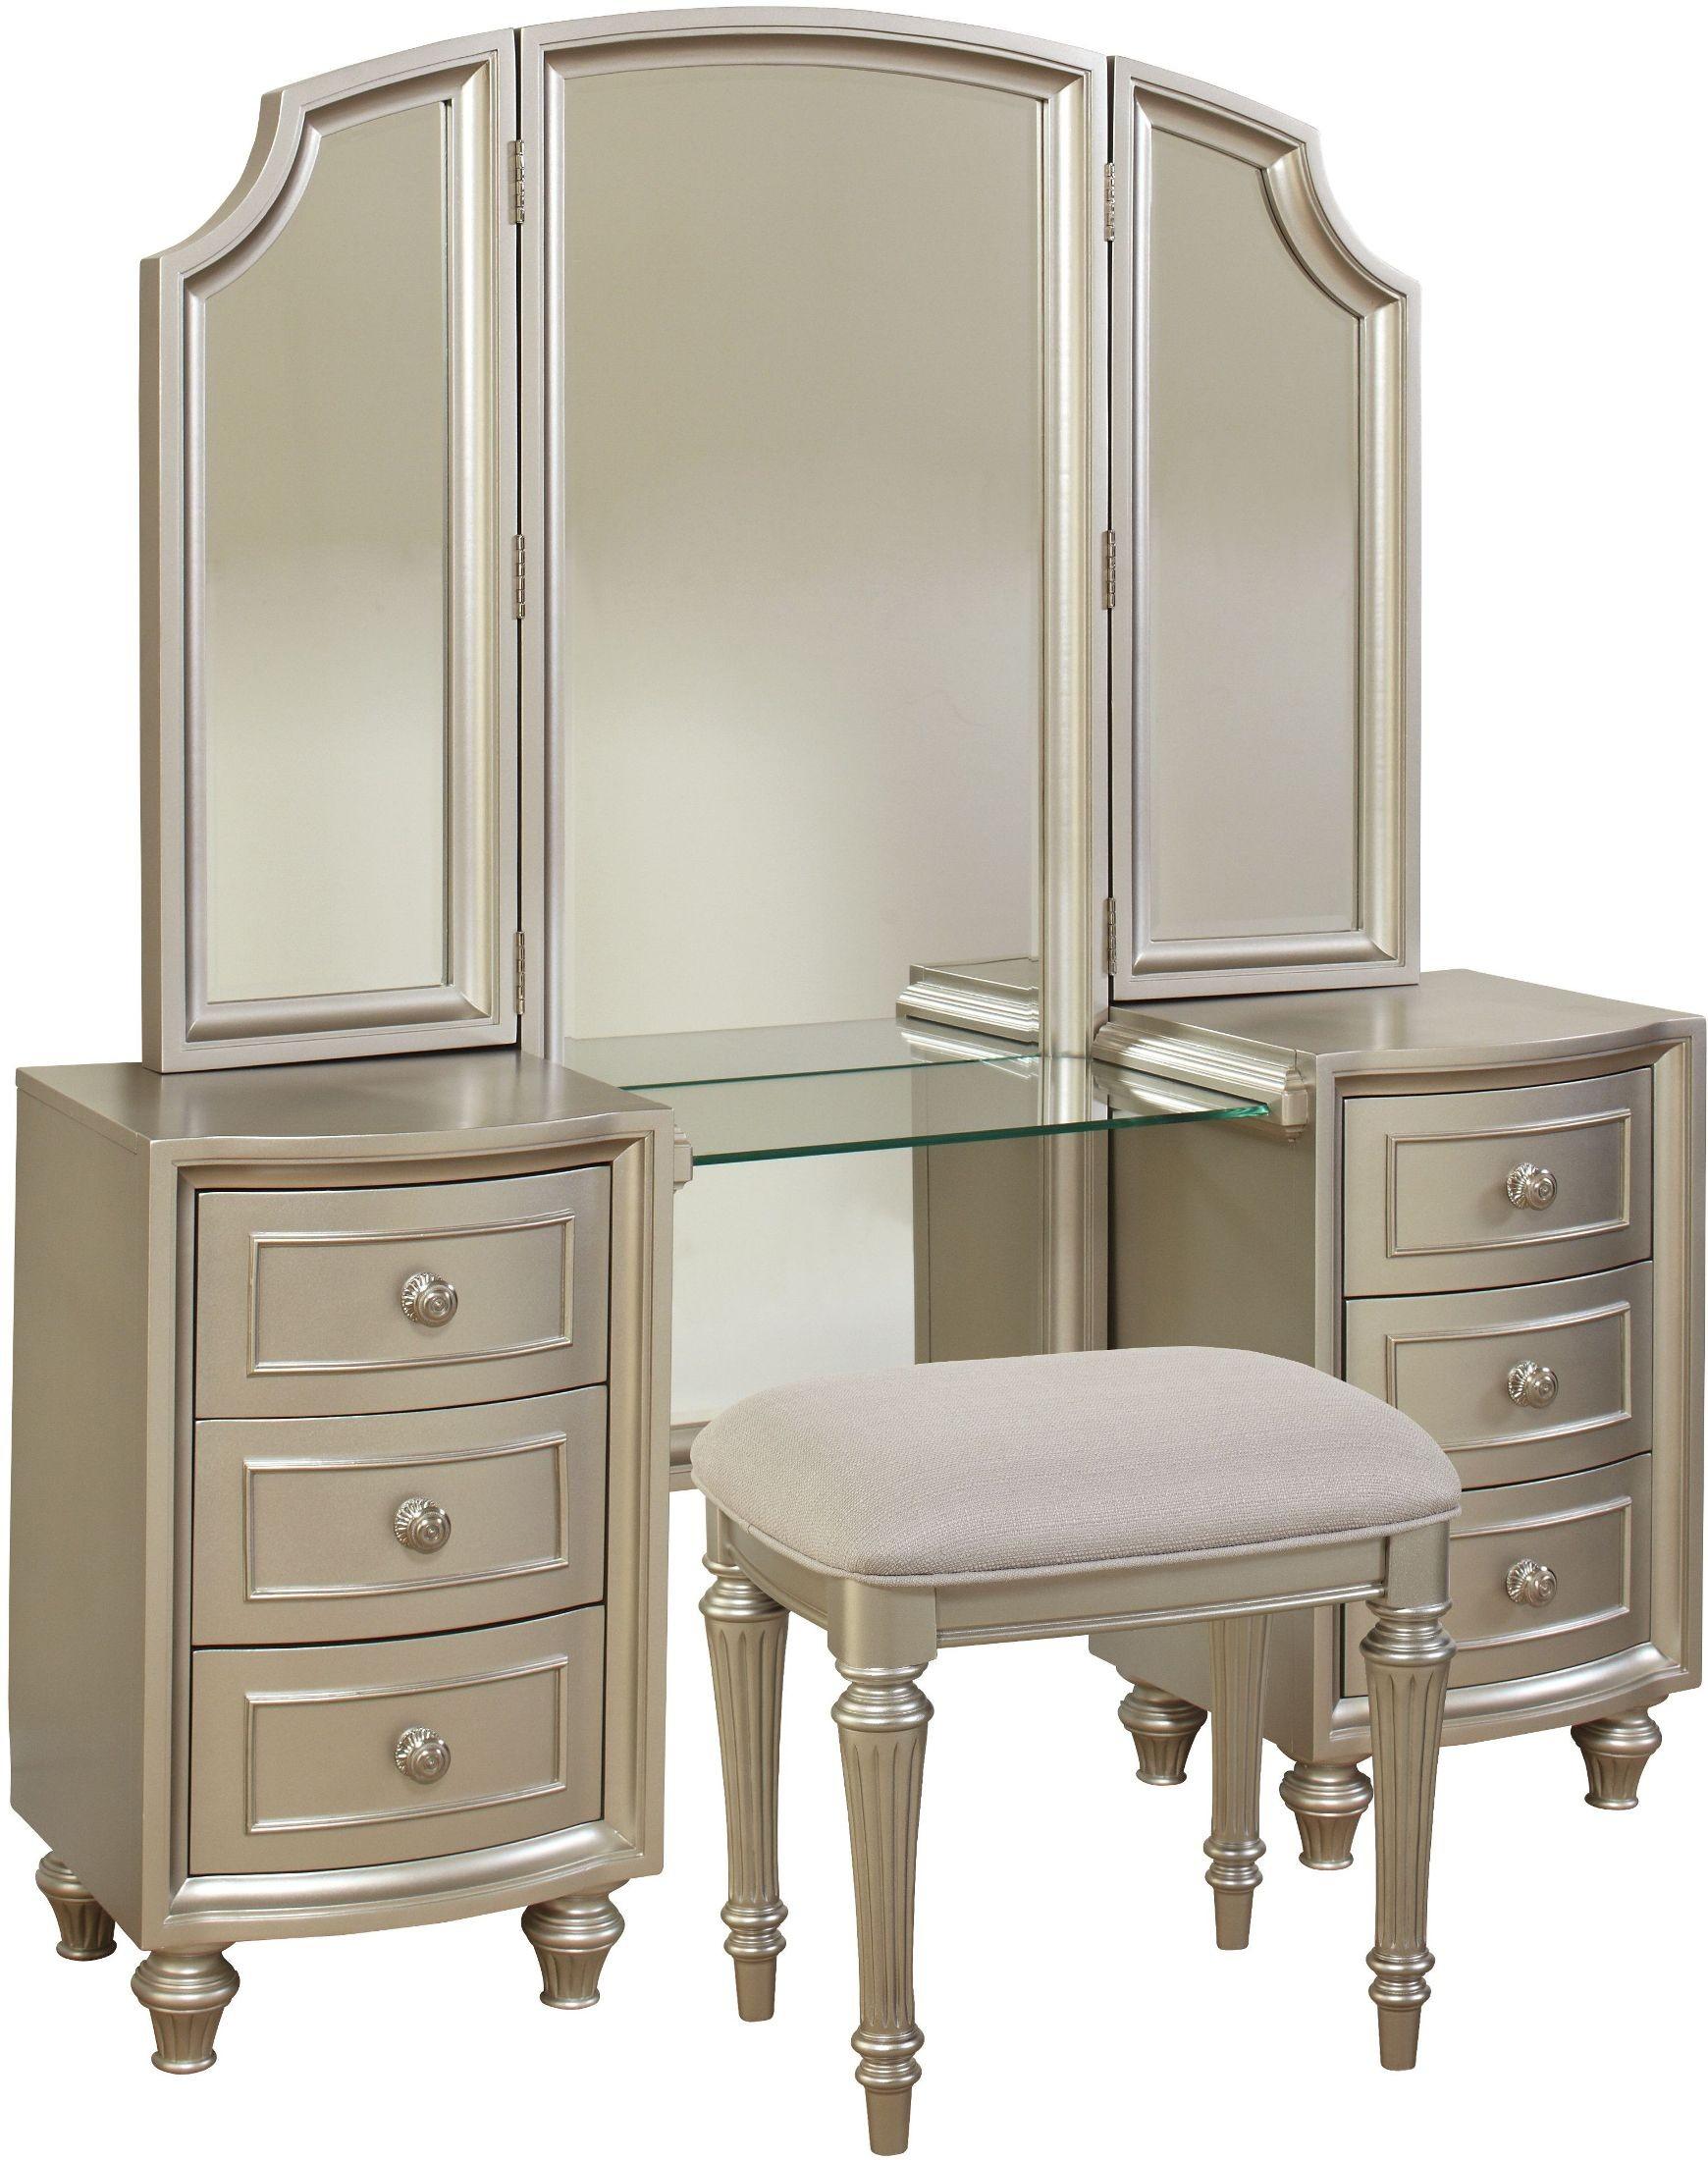 Regency Park Pearlized Silver Vanity Bench From Avalon